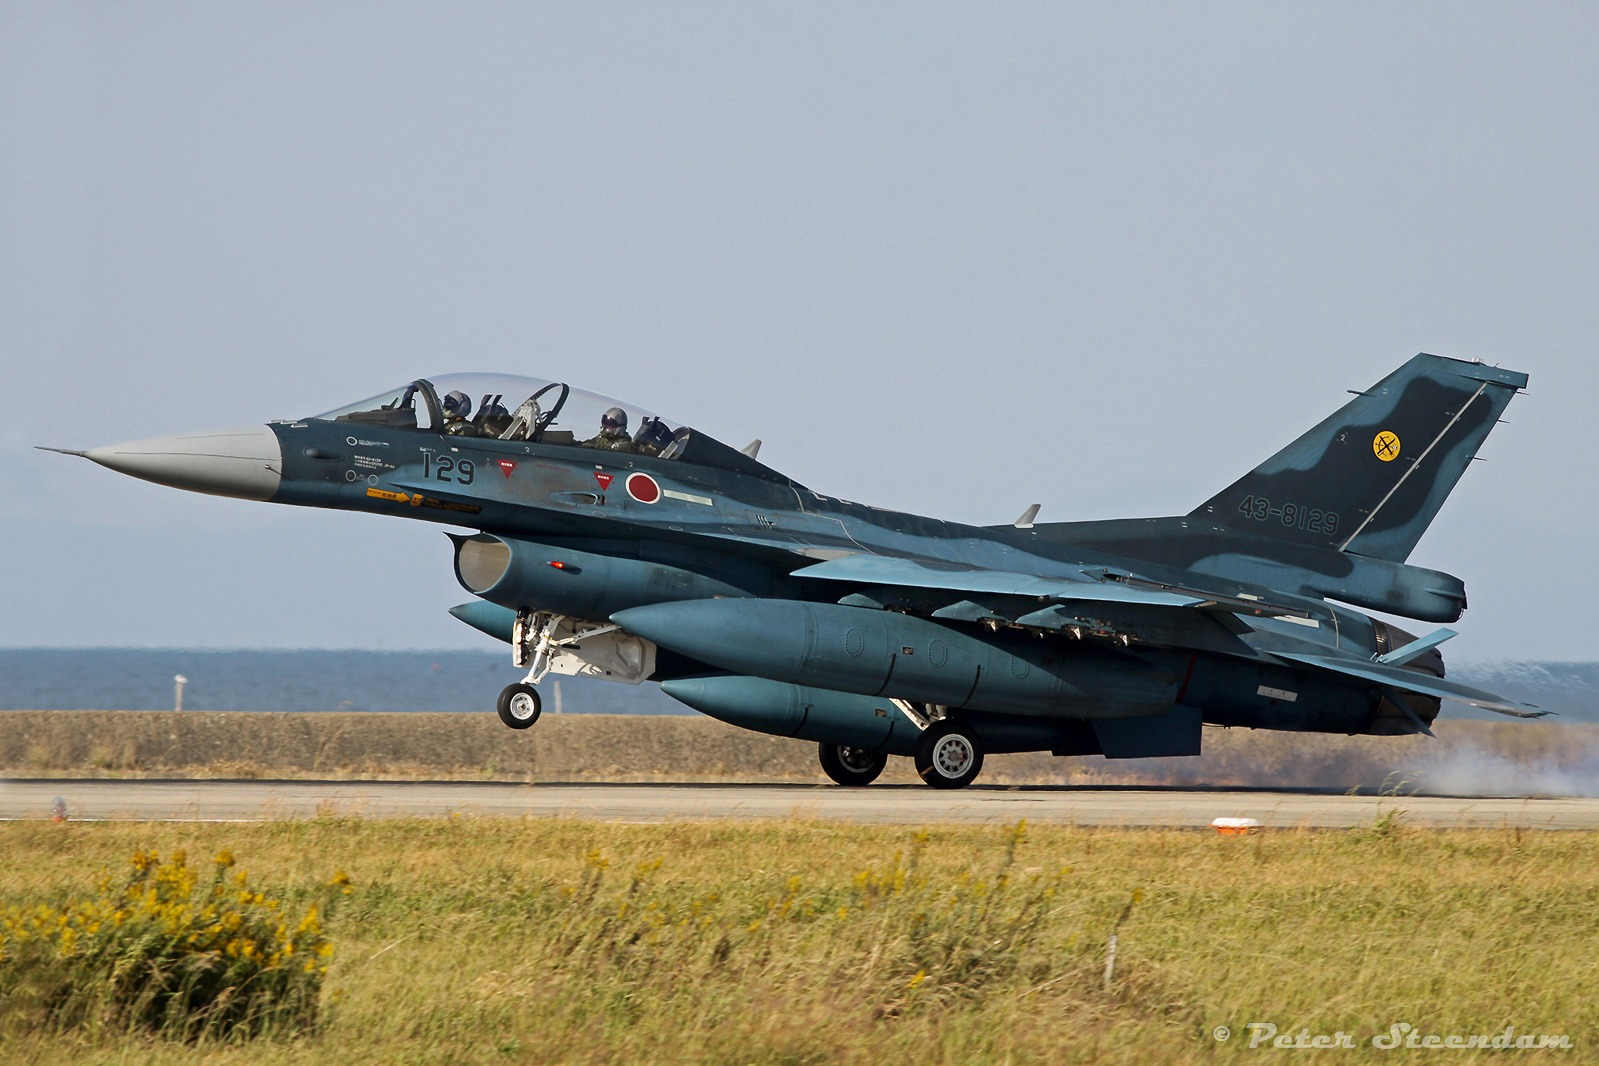 f-2b-43-8129-6-tfs-landing_fb